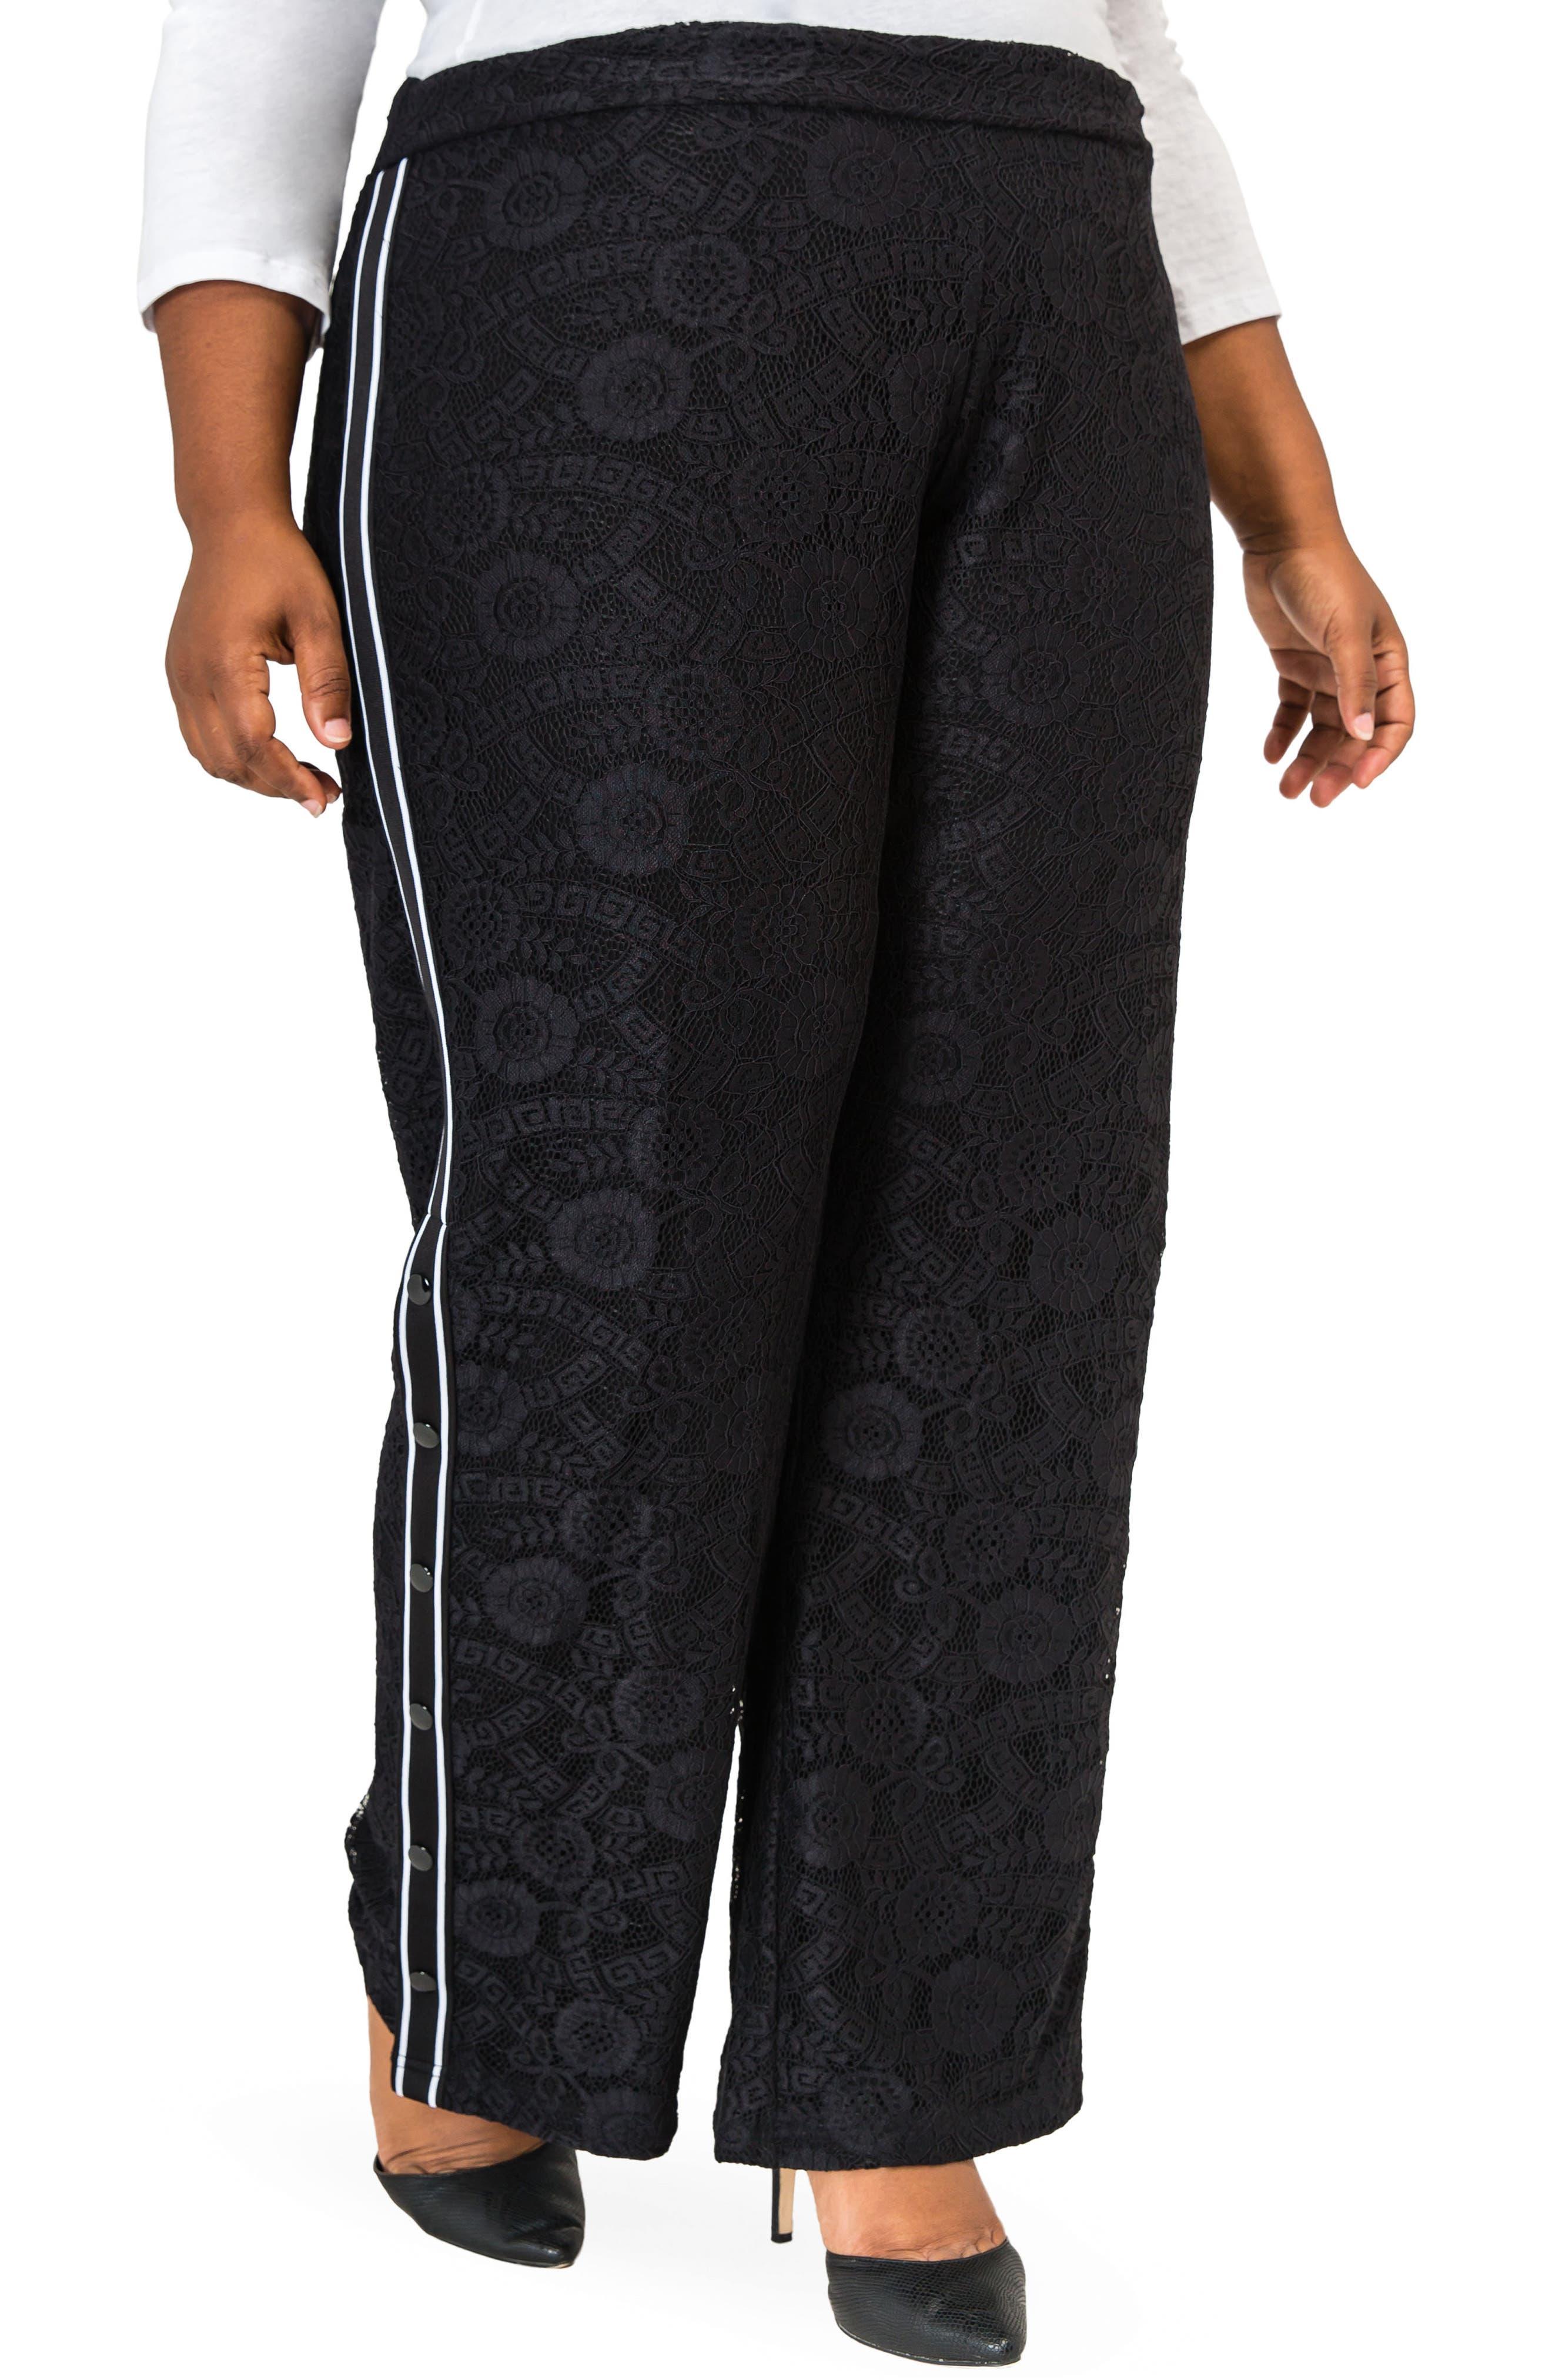 POETIC JUSTICE, Cornella High Rise Lace Knit Track Pants, Main thumbnail 1, color, BLACK